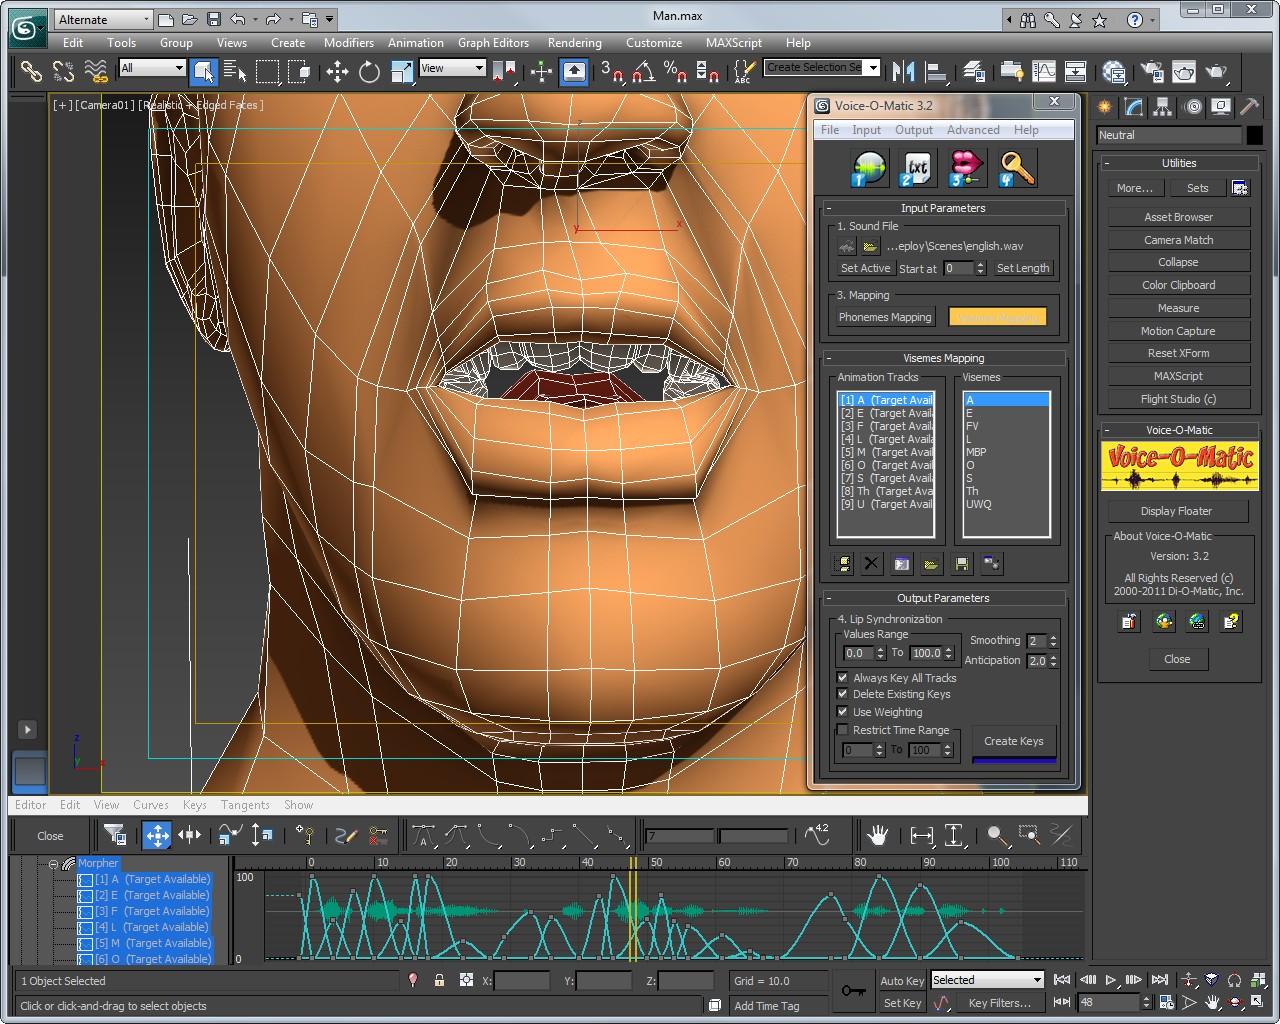 voiceomatic-3dsmax-2013